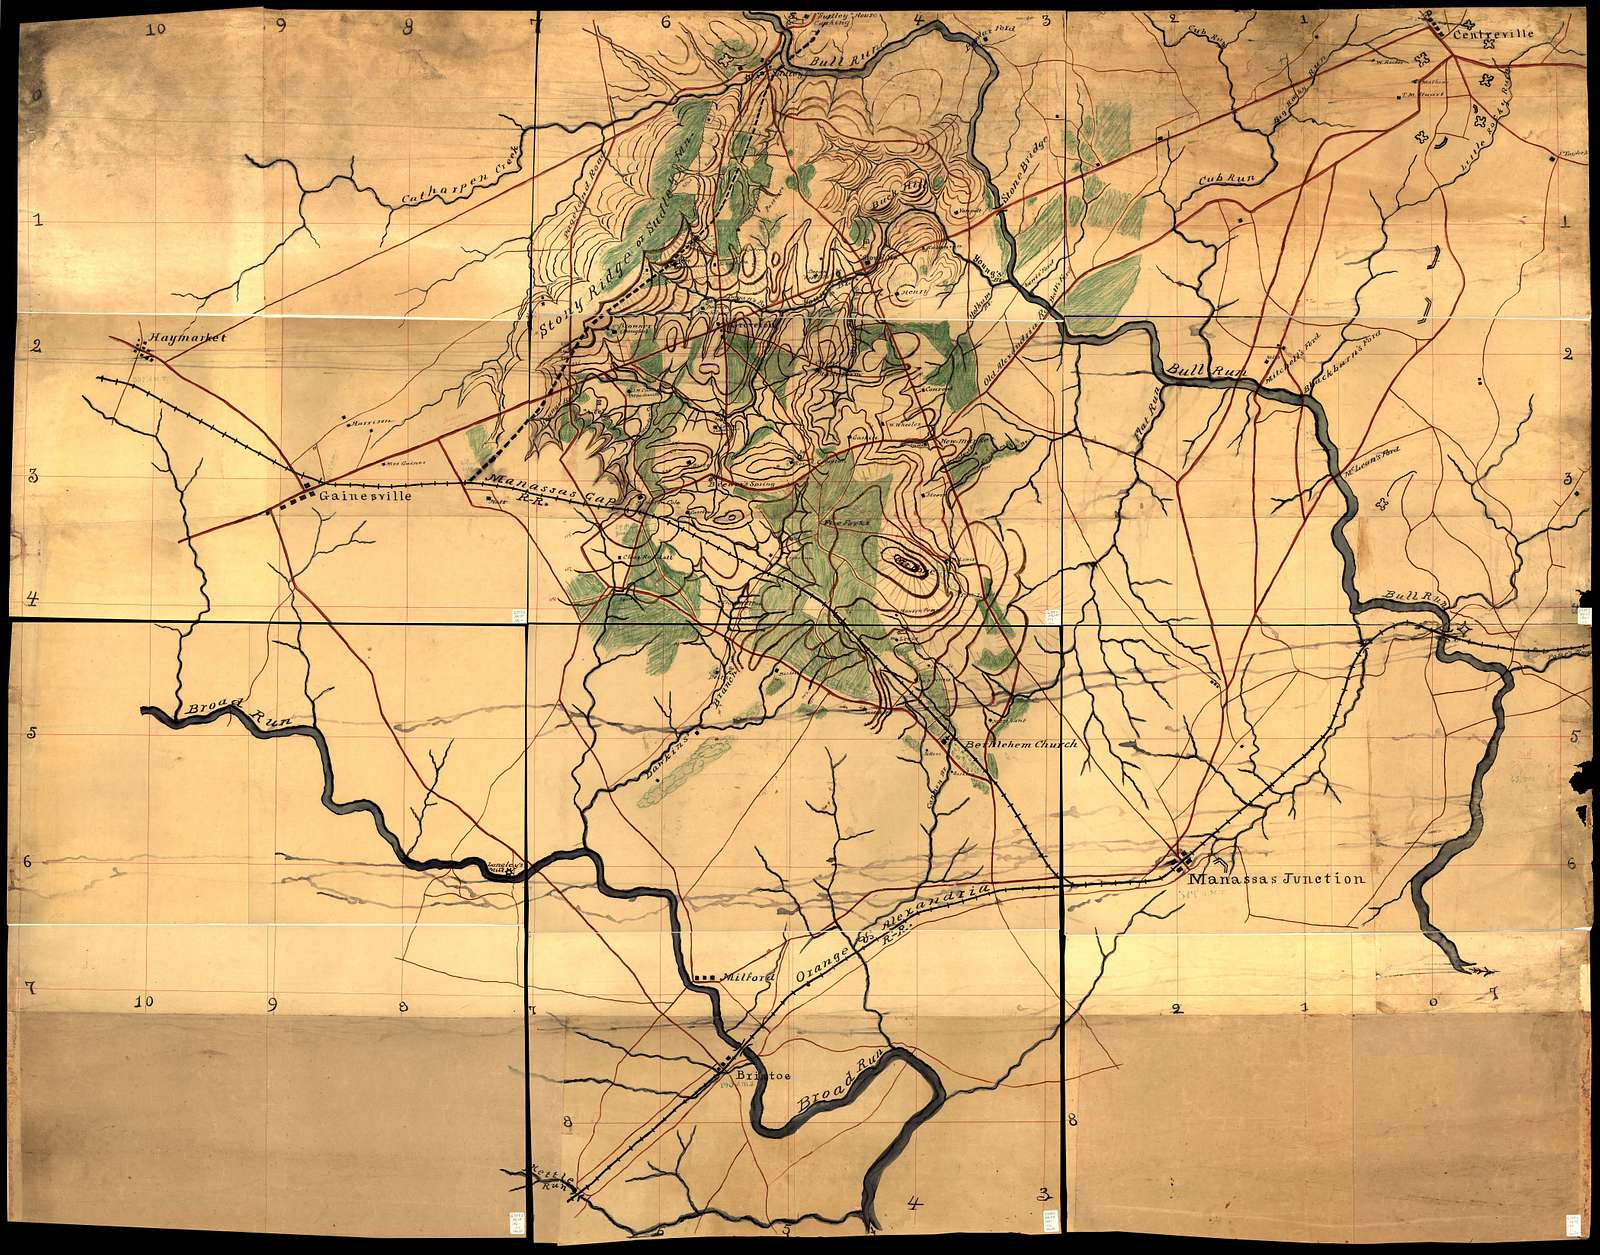 [Map of the Manassas battlefield area in Northern Virginia /